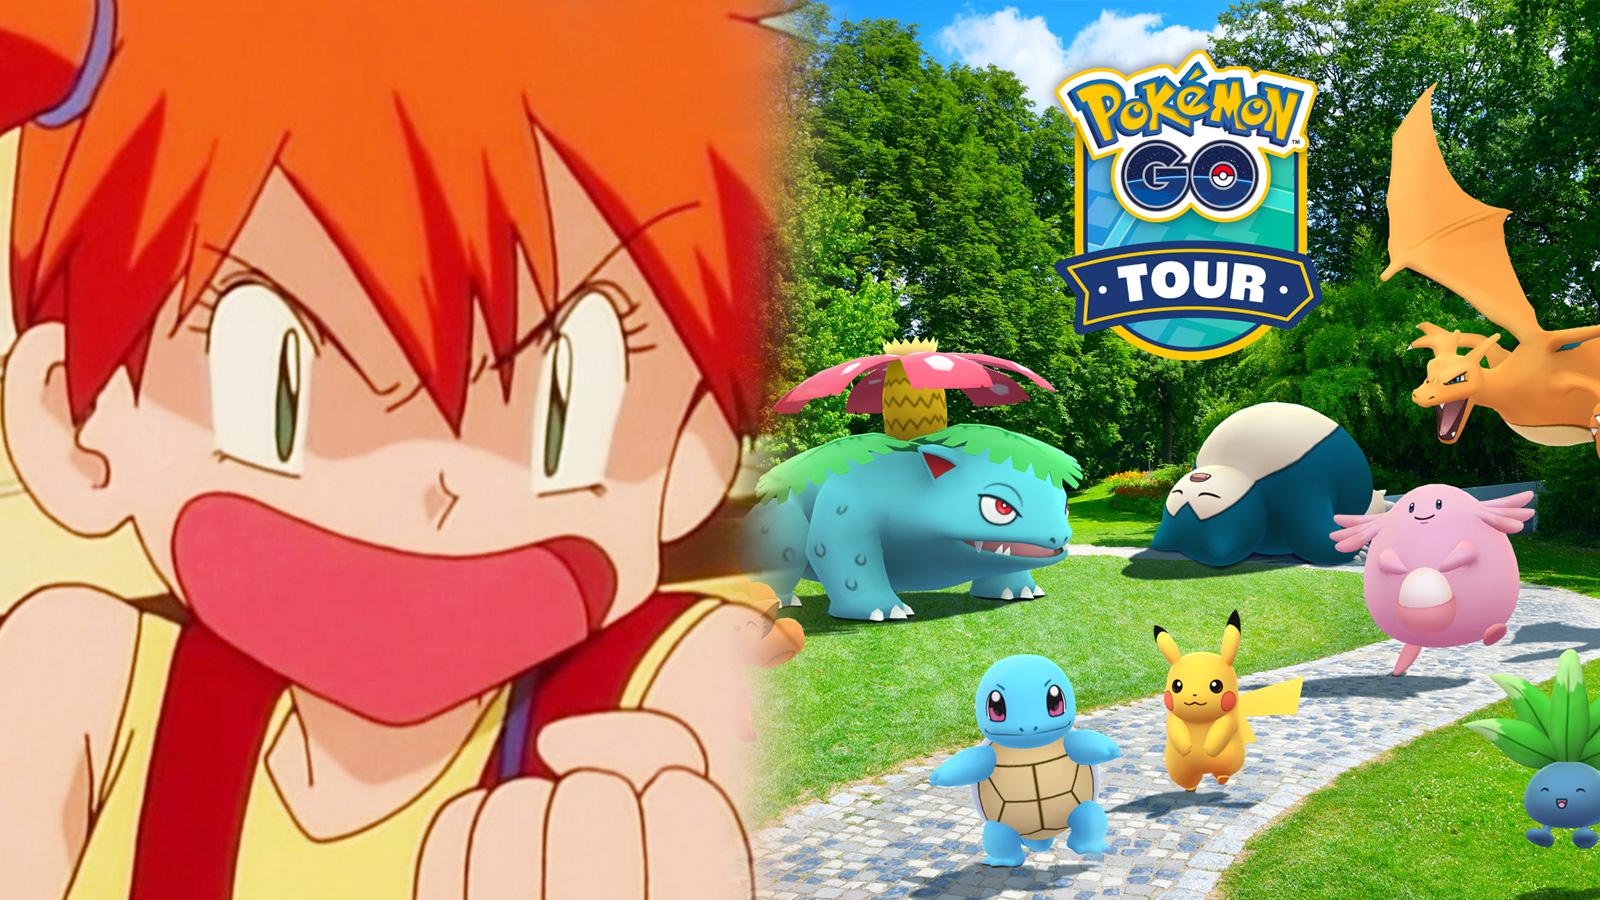 Screenshot of angry Misty from Pokemon anime next to Pokemon Go Kanto Tour promotion.